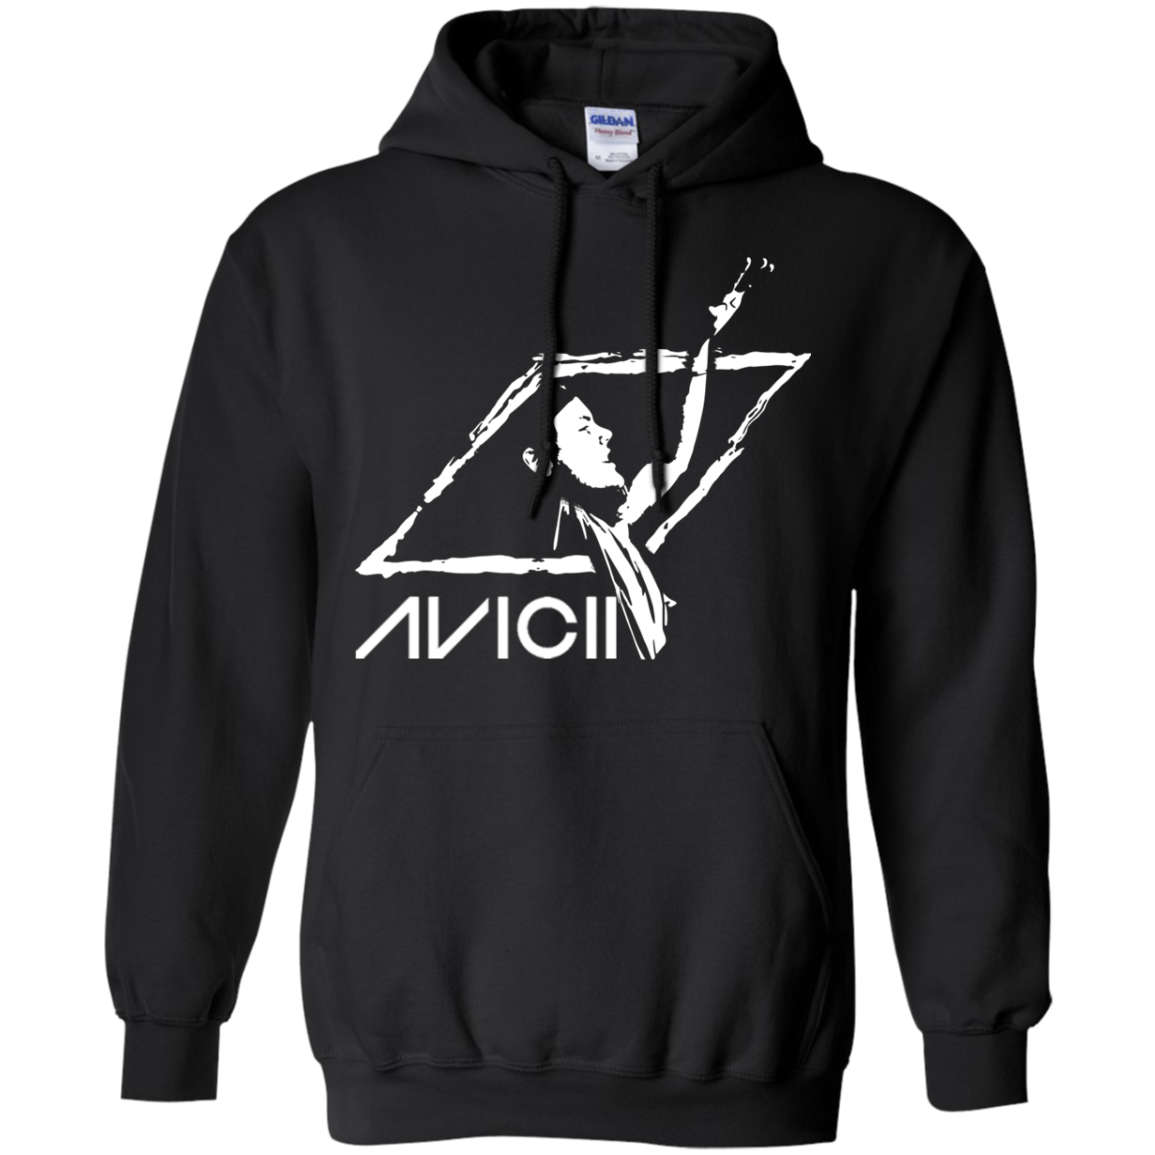 Order Tim Bergling Wake Me Up Avicii Rip Tula Store Shirts